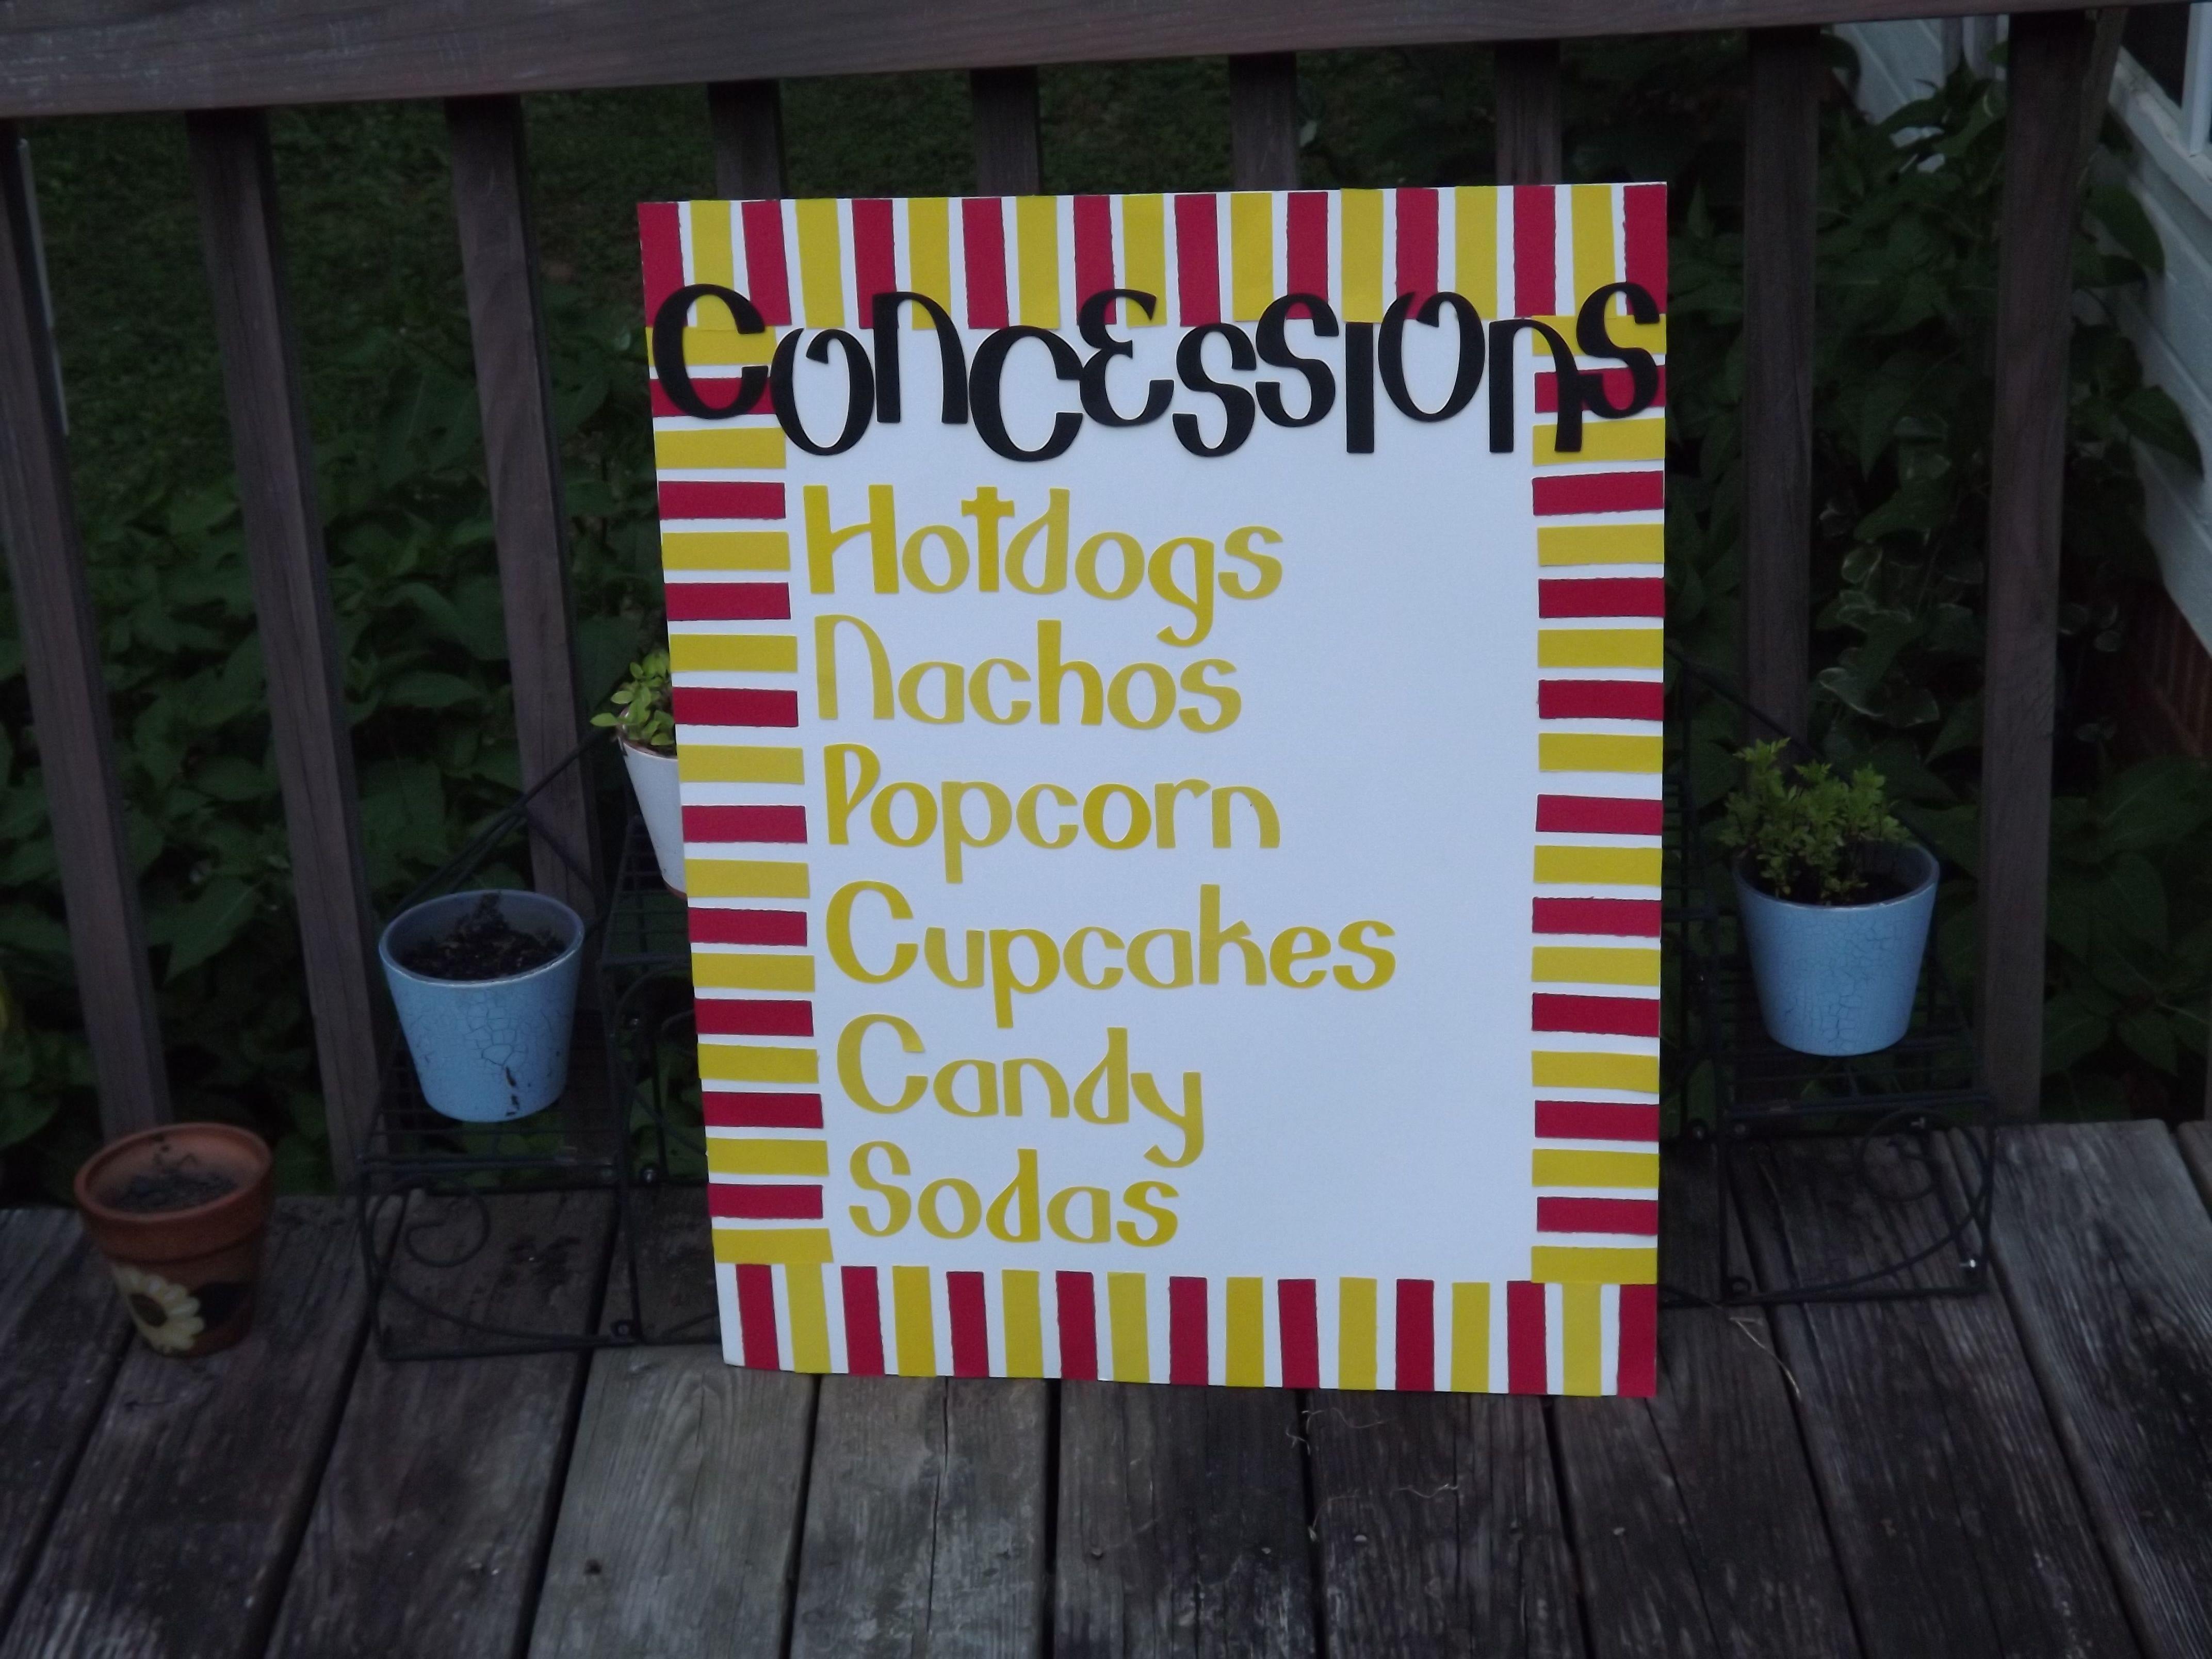 movie night concession stand menu board